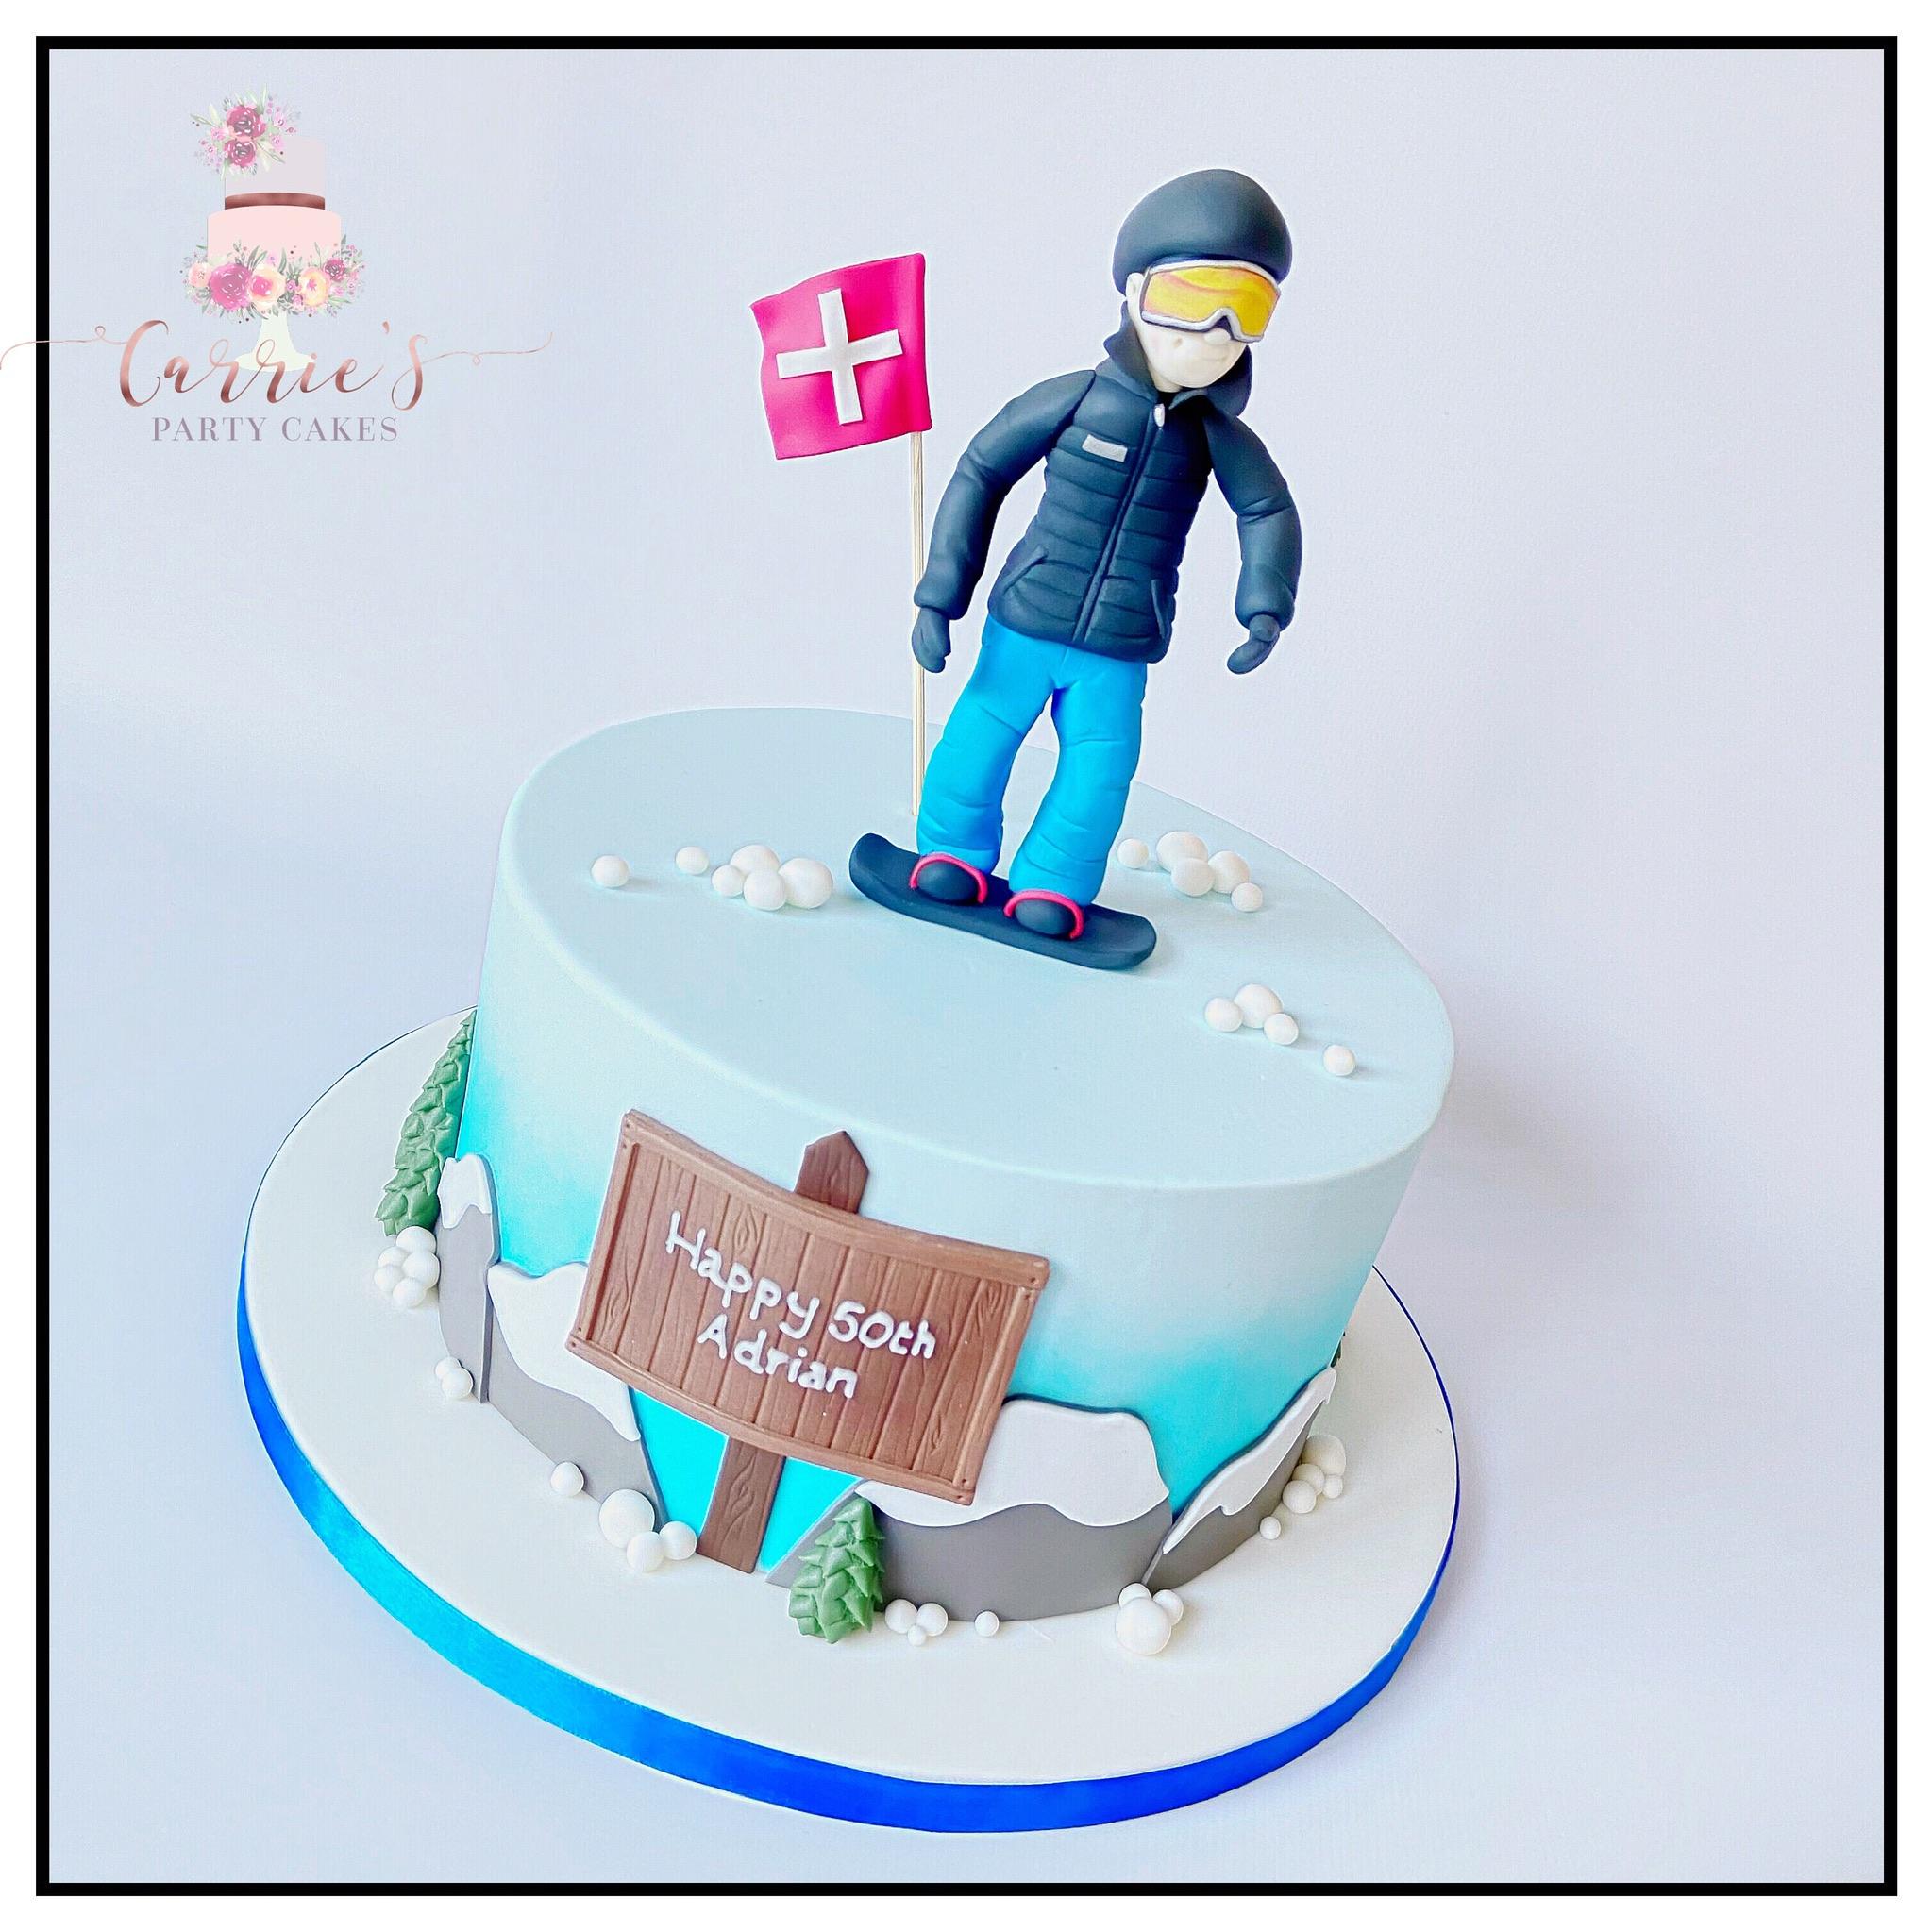 snowboarder cake